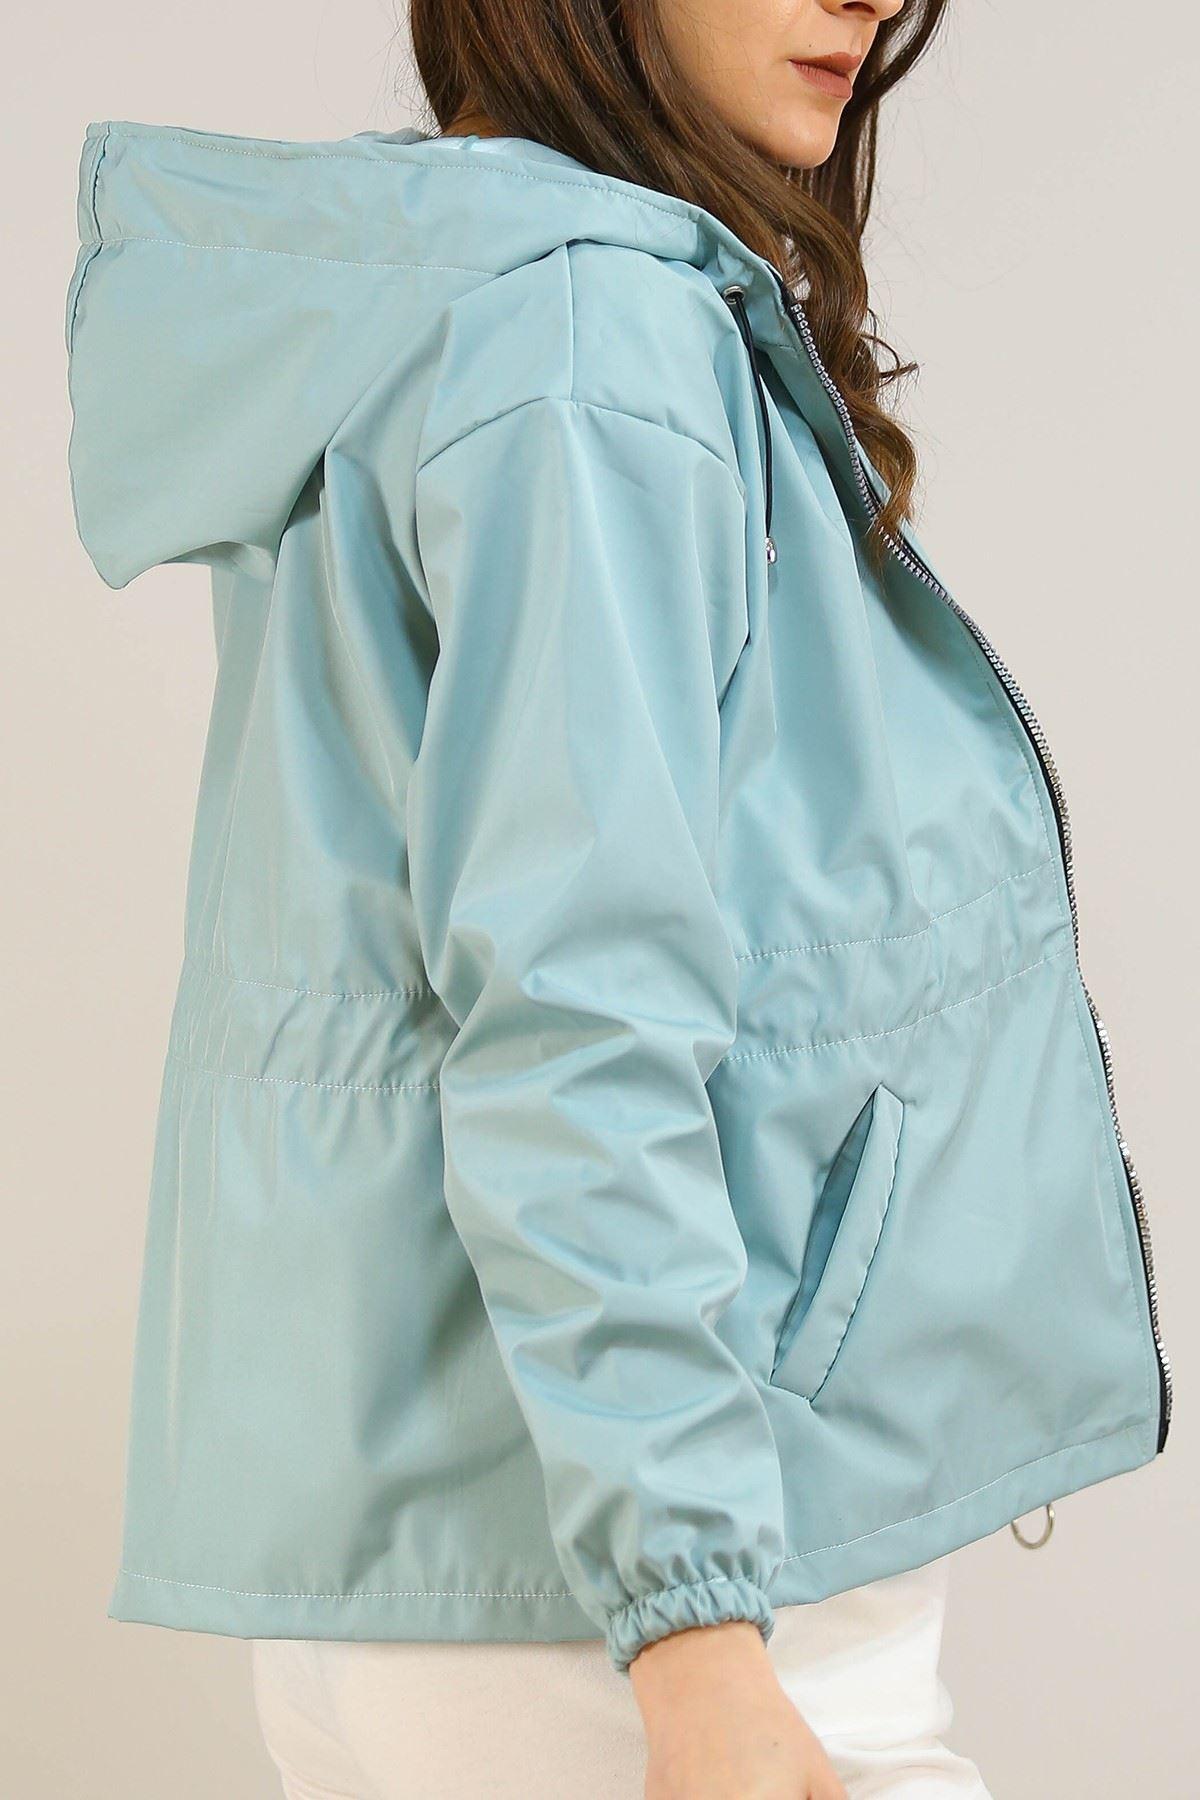 Kapşonlu Fermuarlı Ceket Mint - 5230.240.